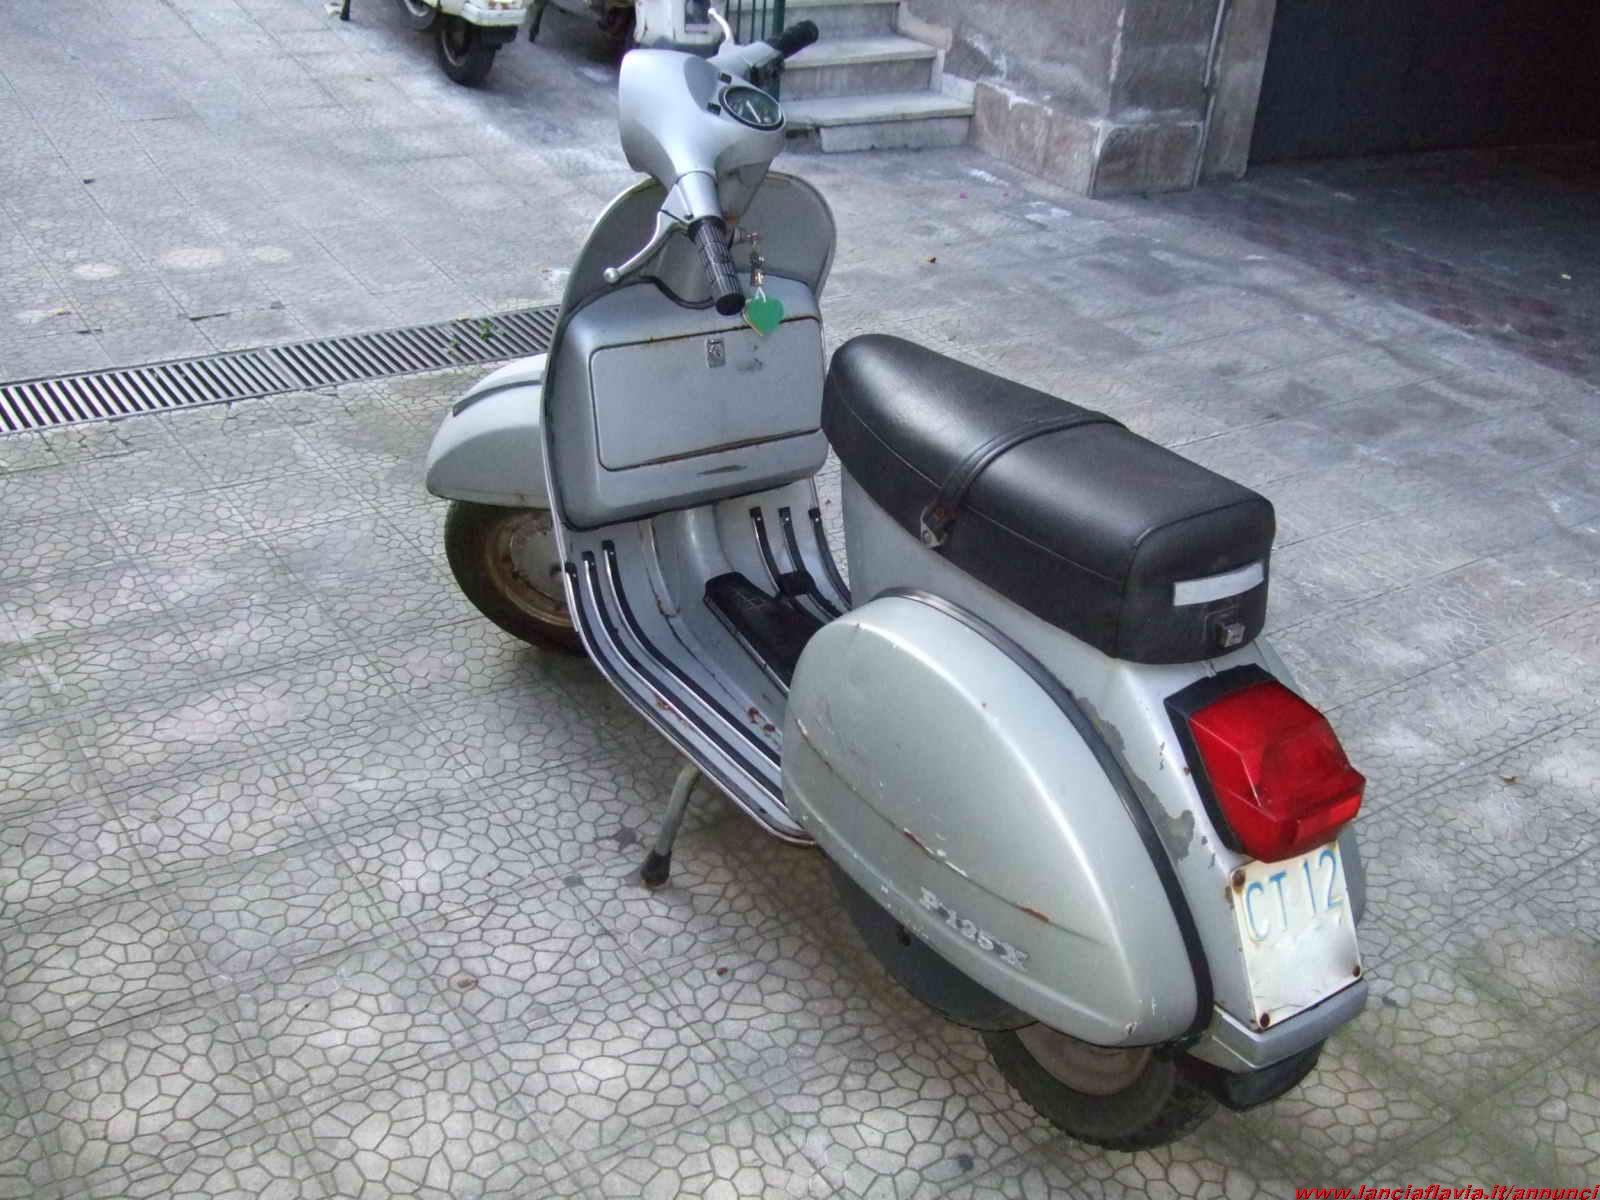 Vespa 125 px Scheda Tecnica Piaggio Vespa 125 px Senza